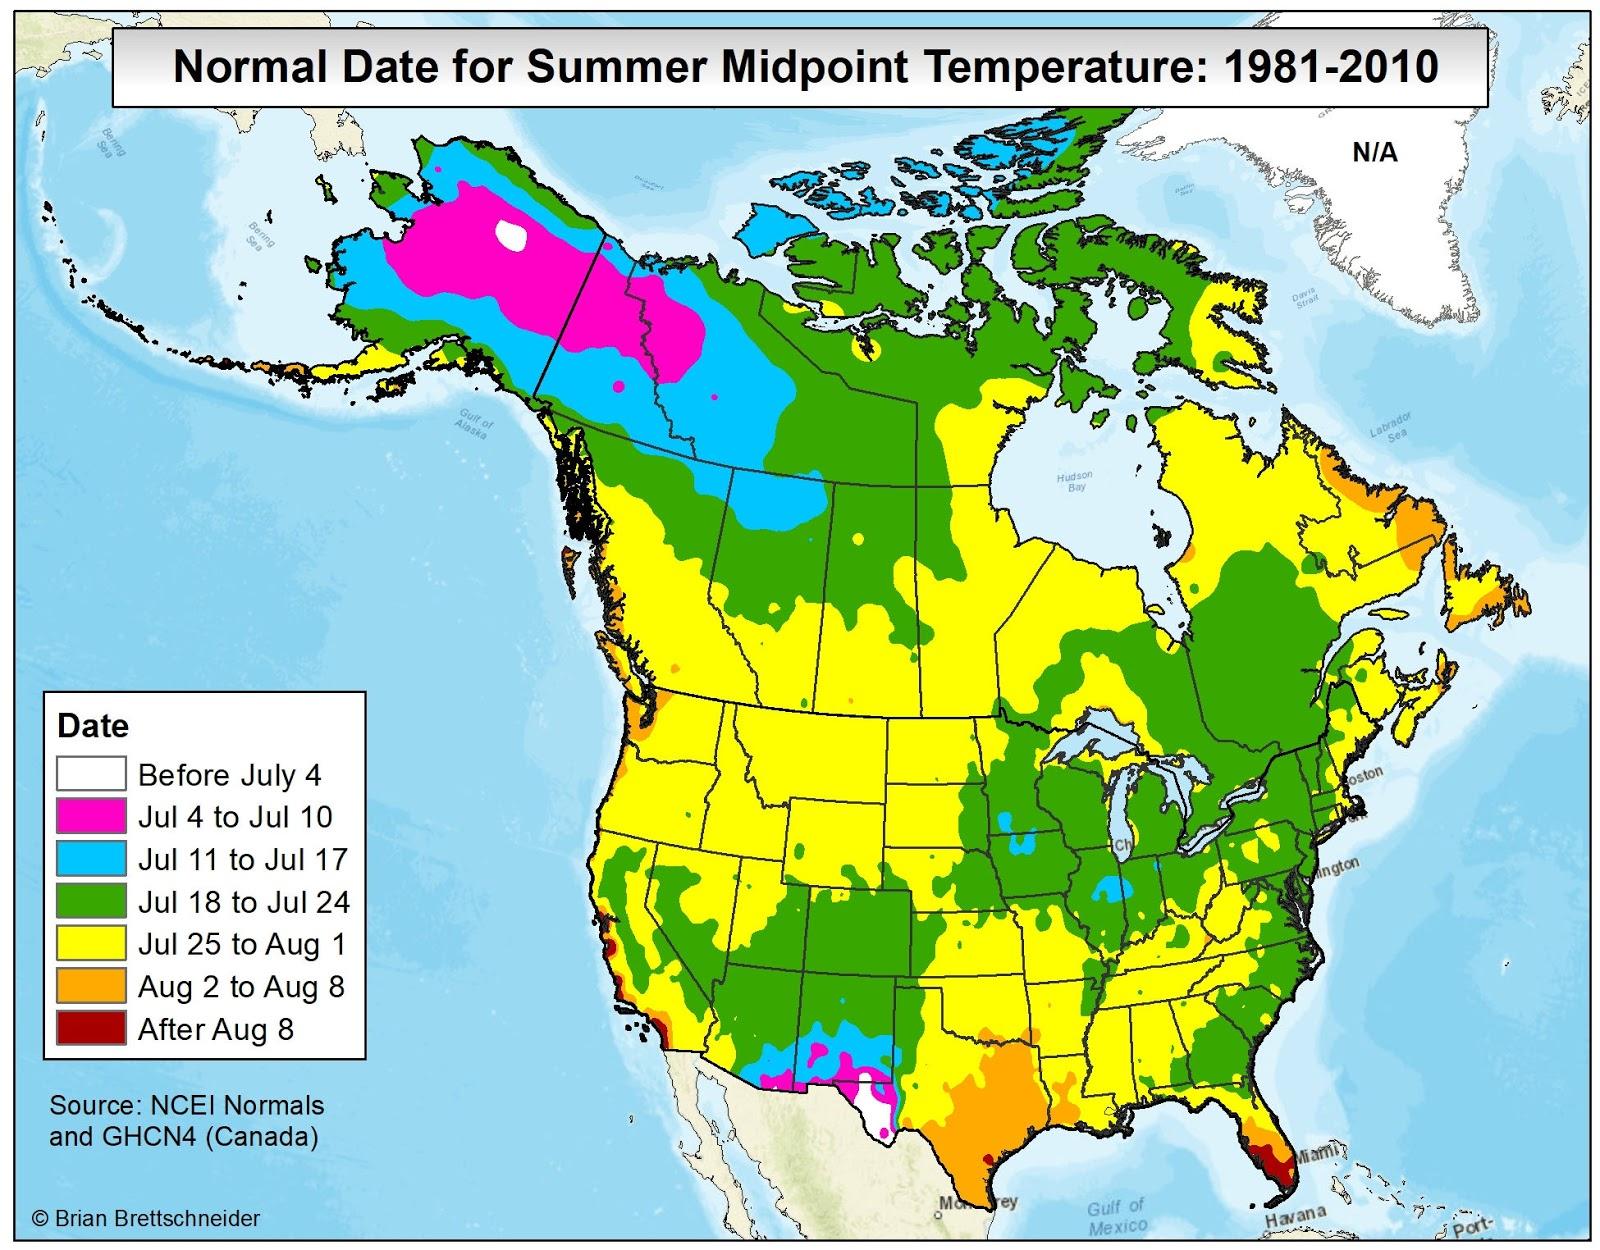 Brian B's Climate Blog: Average Annual High Temperature Vs. Climate - Texas Temperature Map